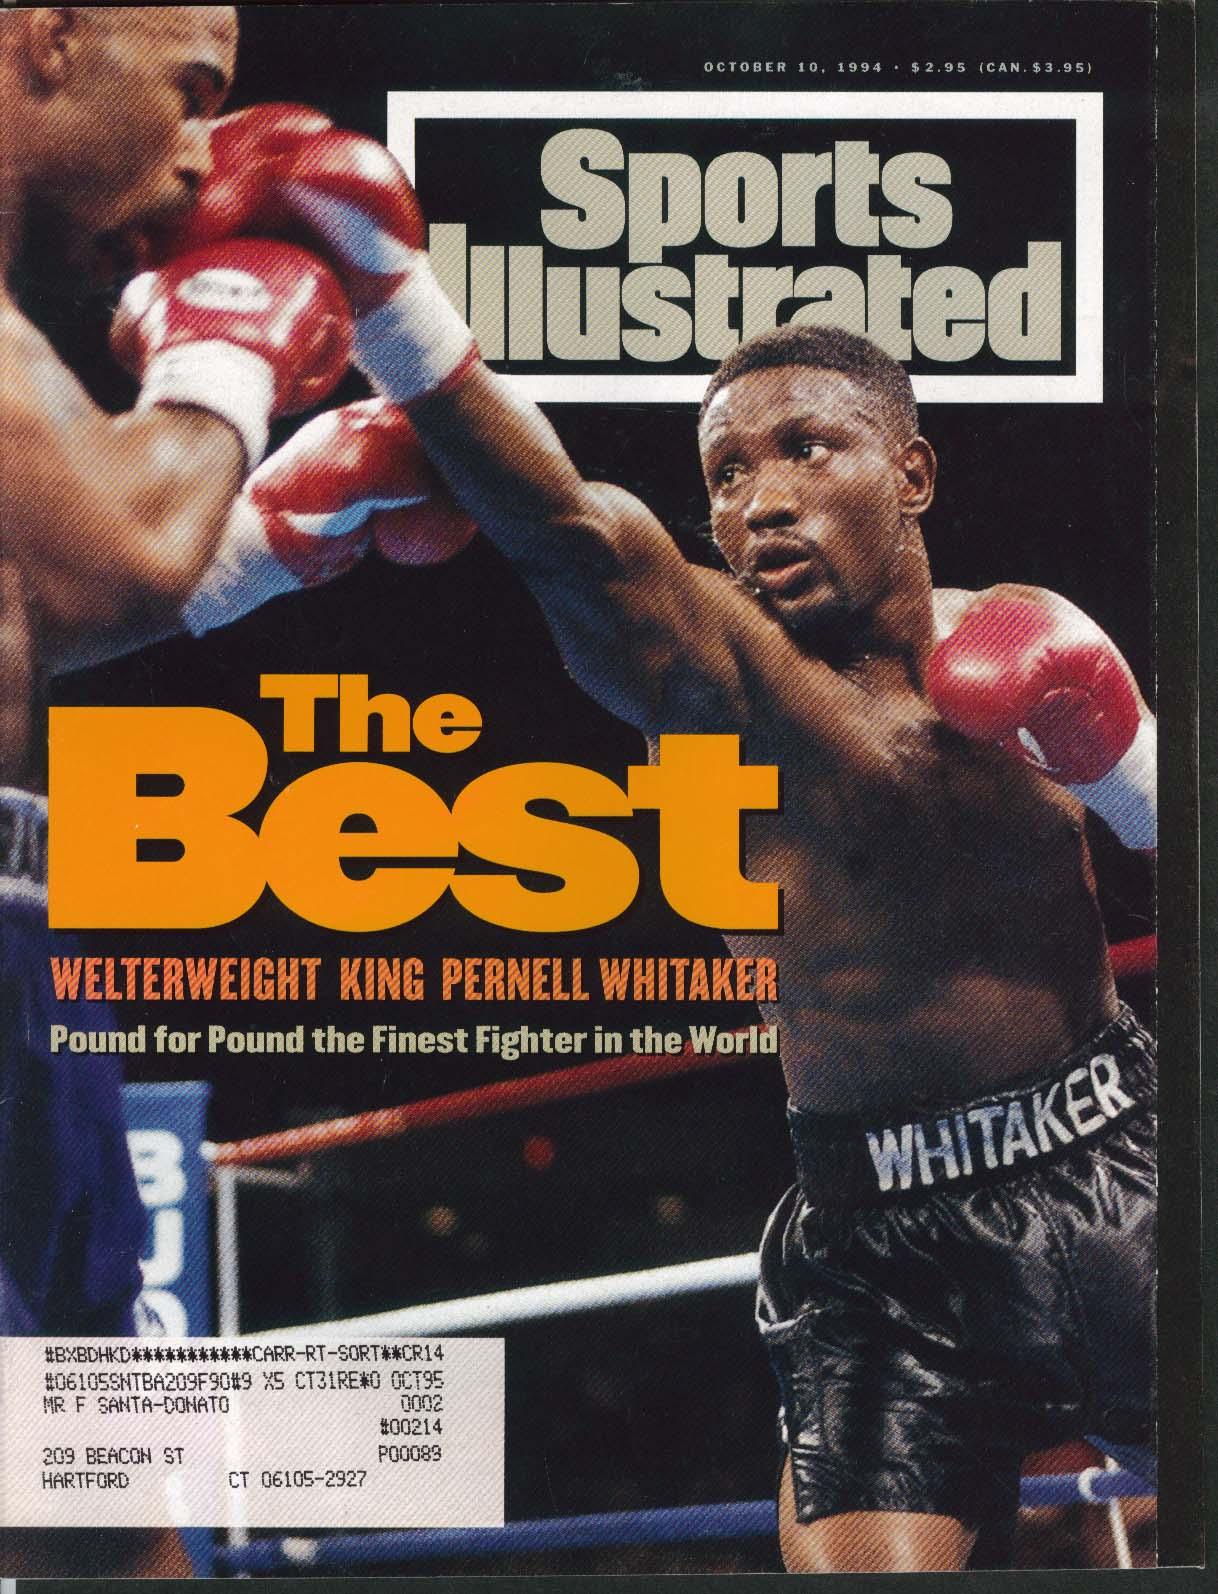 SPORTS ILLUSTRATED Pernell Whitaker Larry Johnson Buddy Ryan 10/10 1994